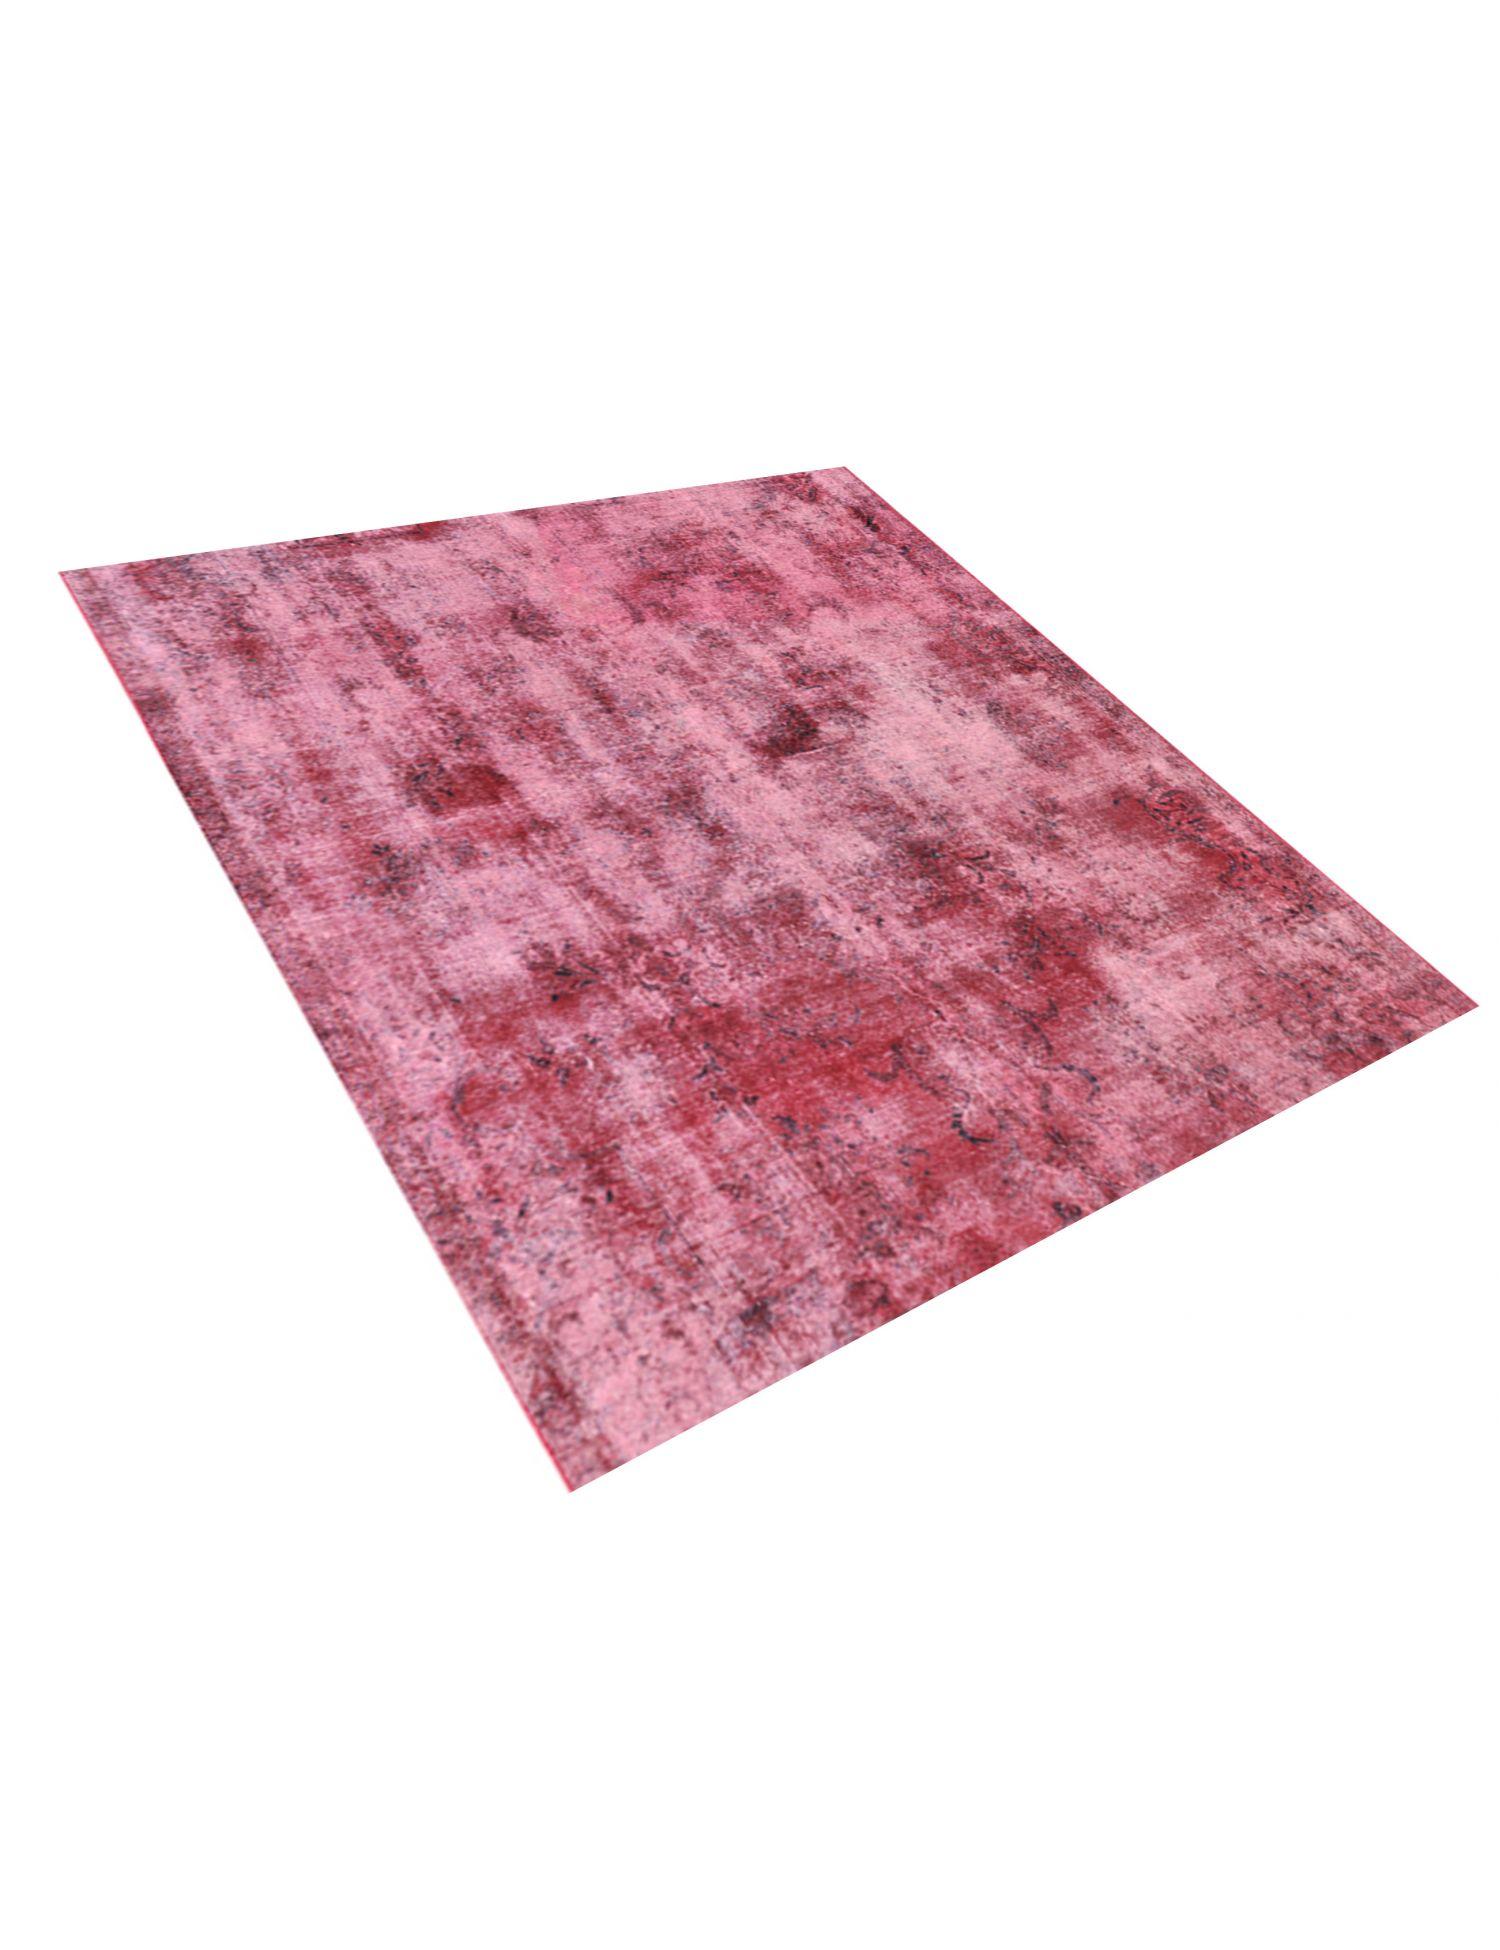 Vintage Teppich  rot <br/>230 x 230 cm